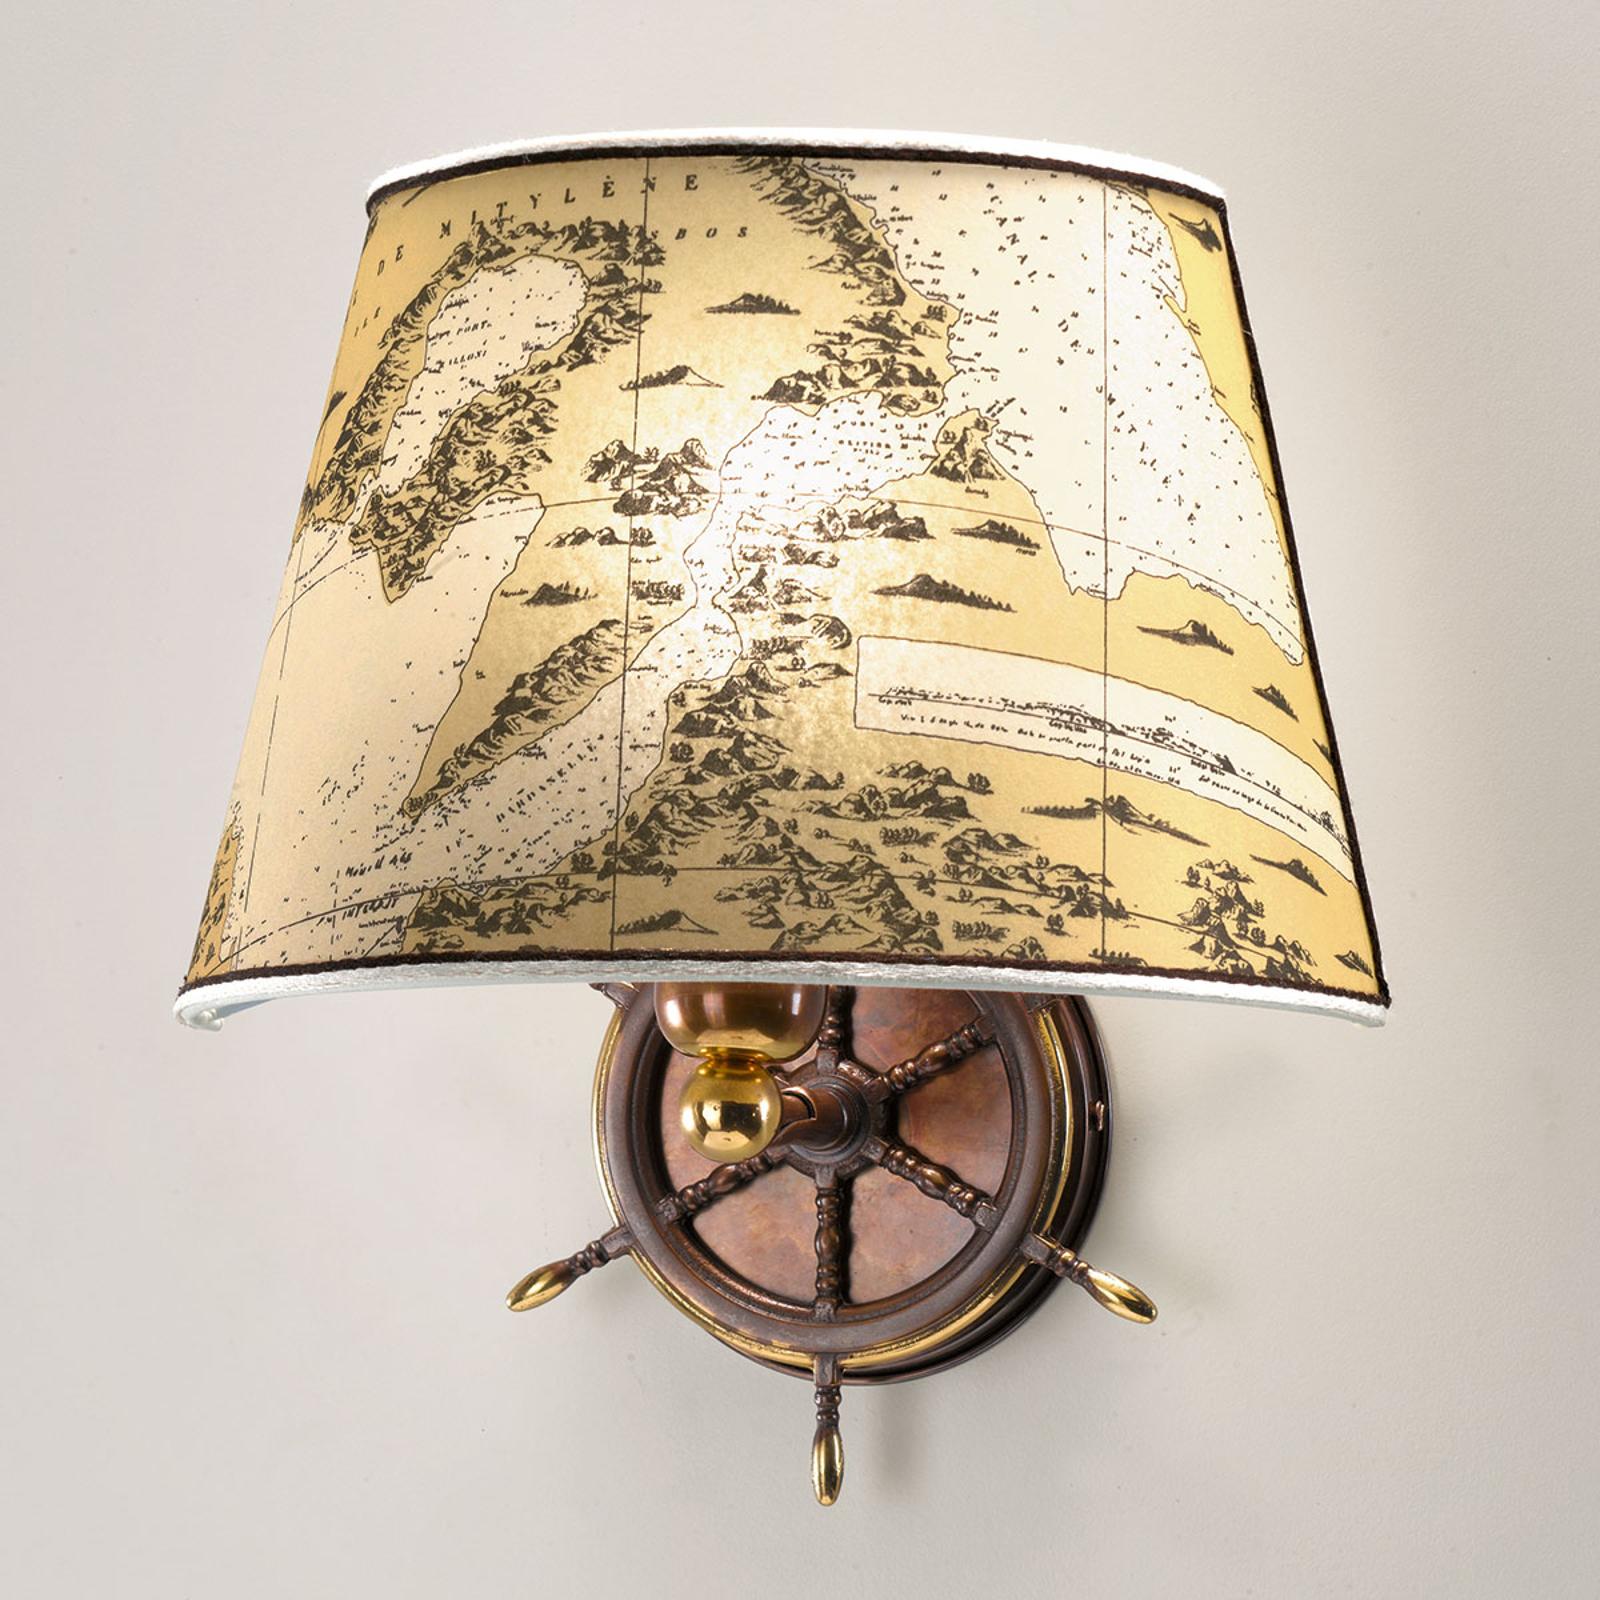 Nautica maritime wall light, one-bulb, 30cm_2008128_1